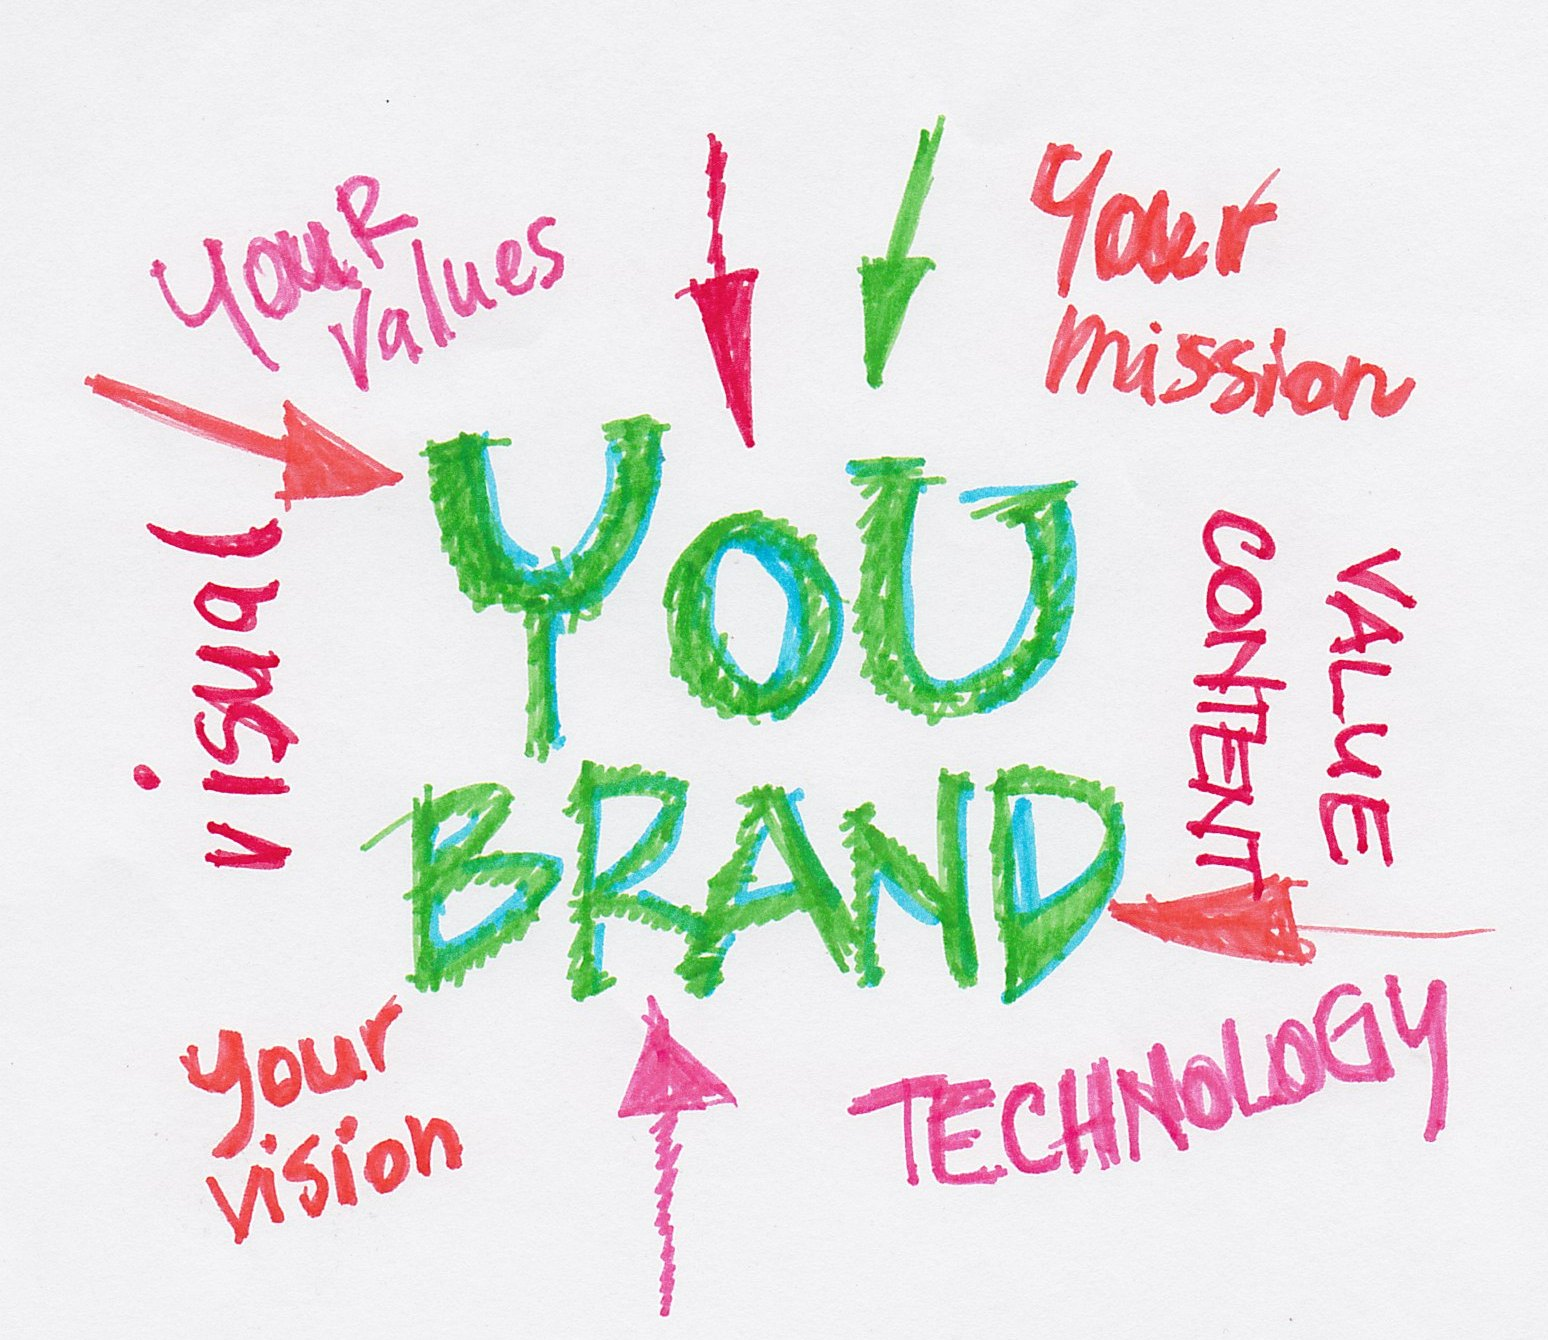 branding personal brand beyond startups followers than ensure things